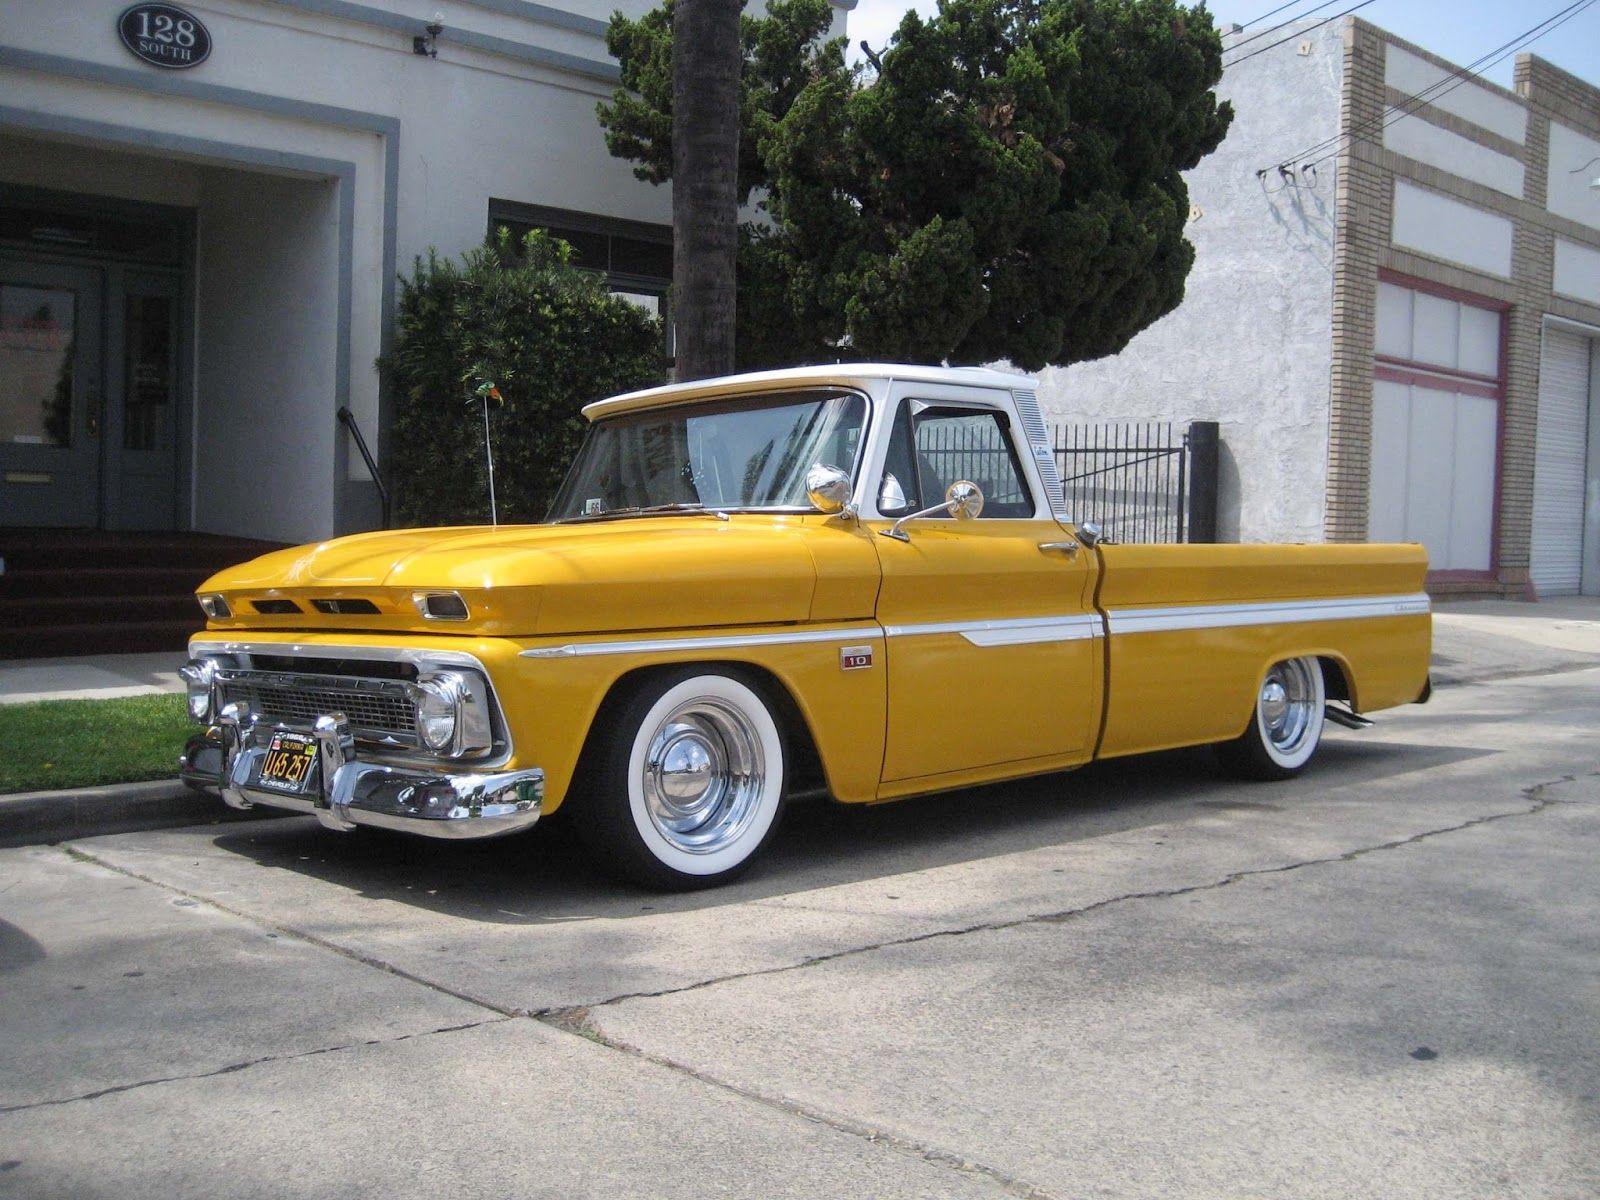 Cool Chevy Trucks | 62 Chevy Truck Cool Long Bed - Chevy Trucks ...